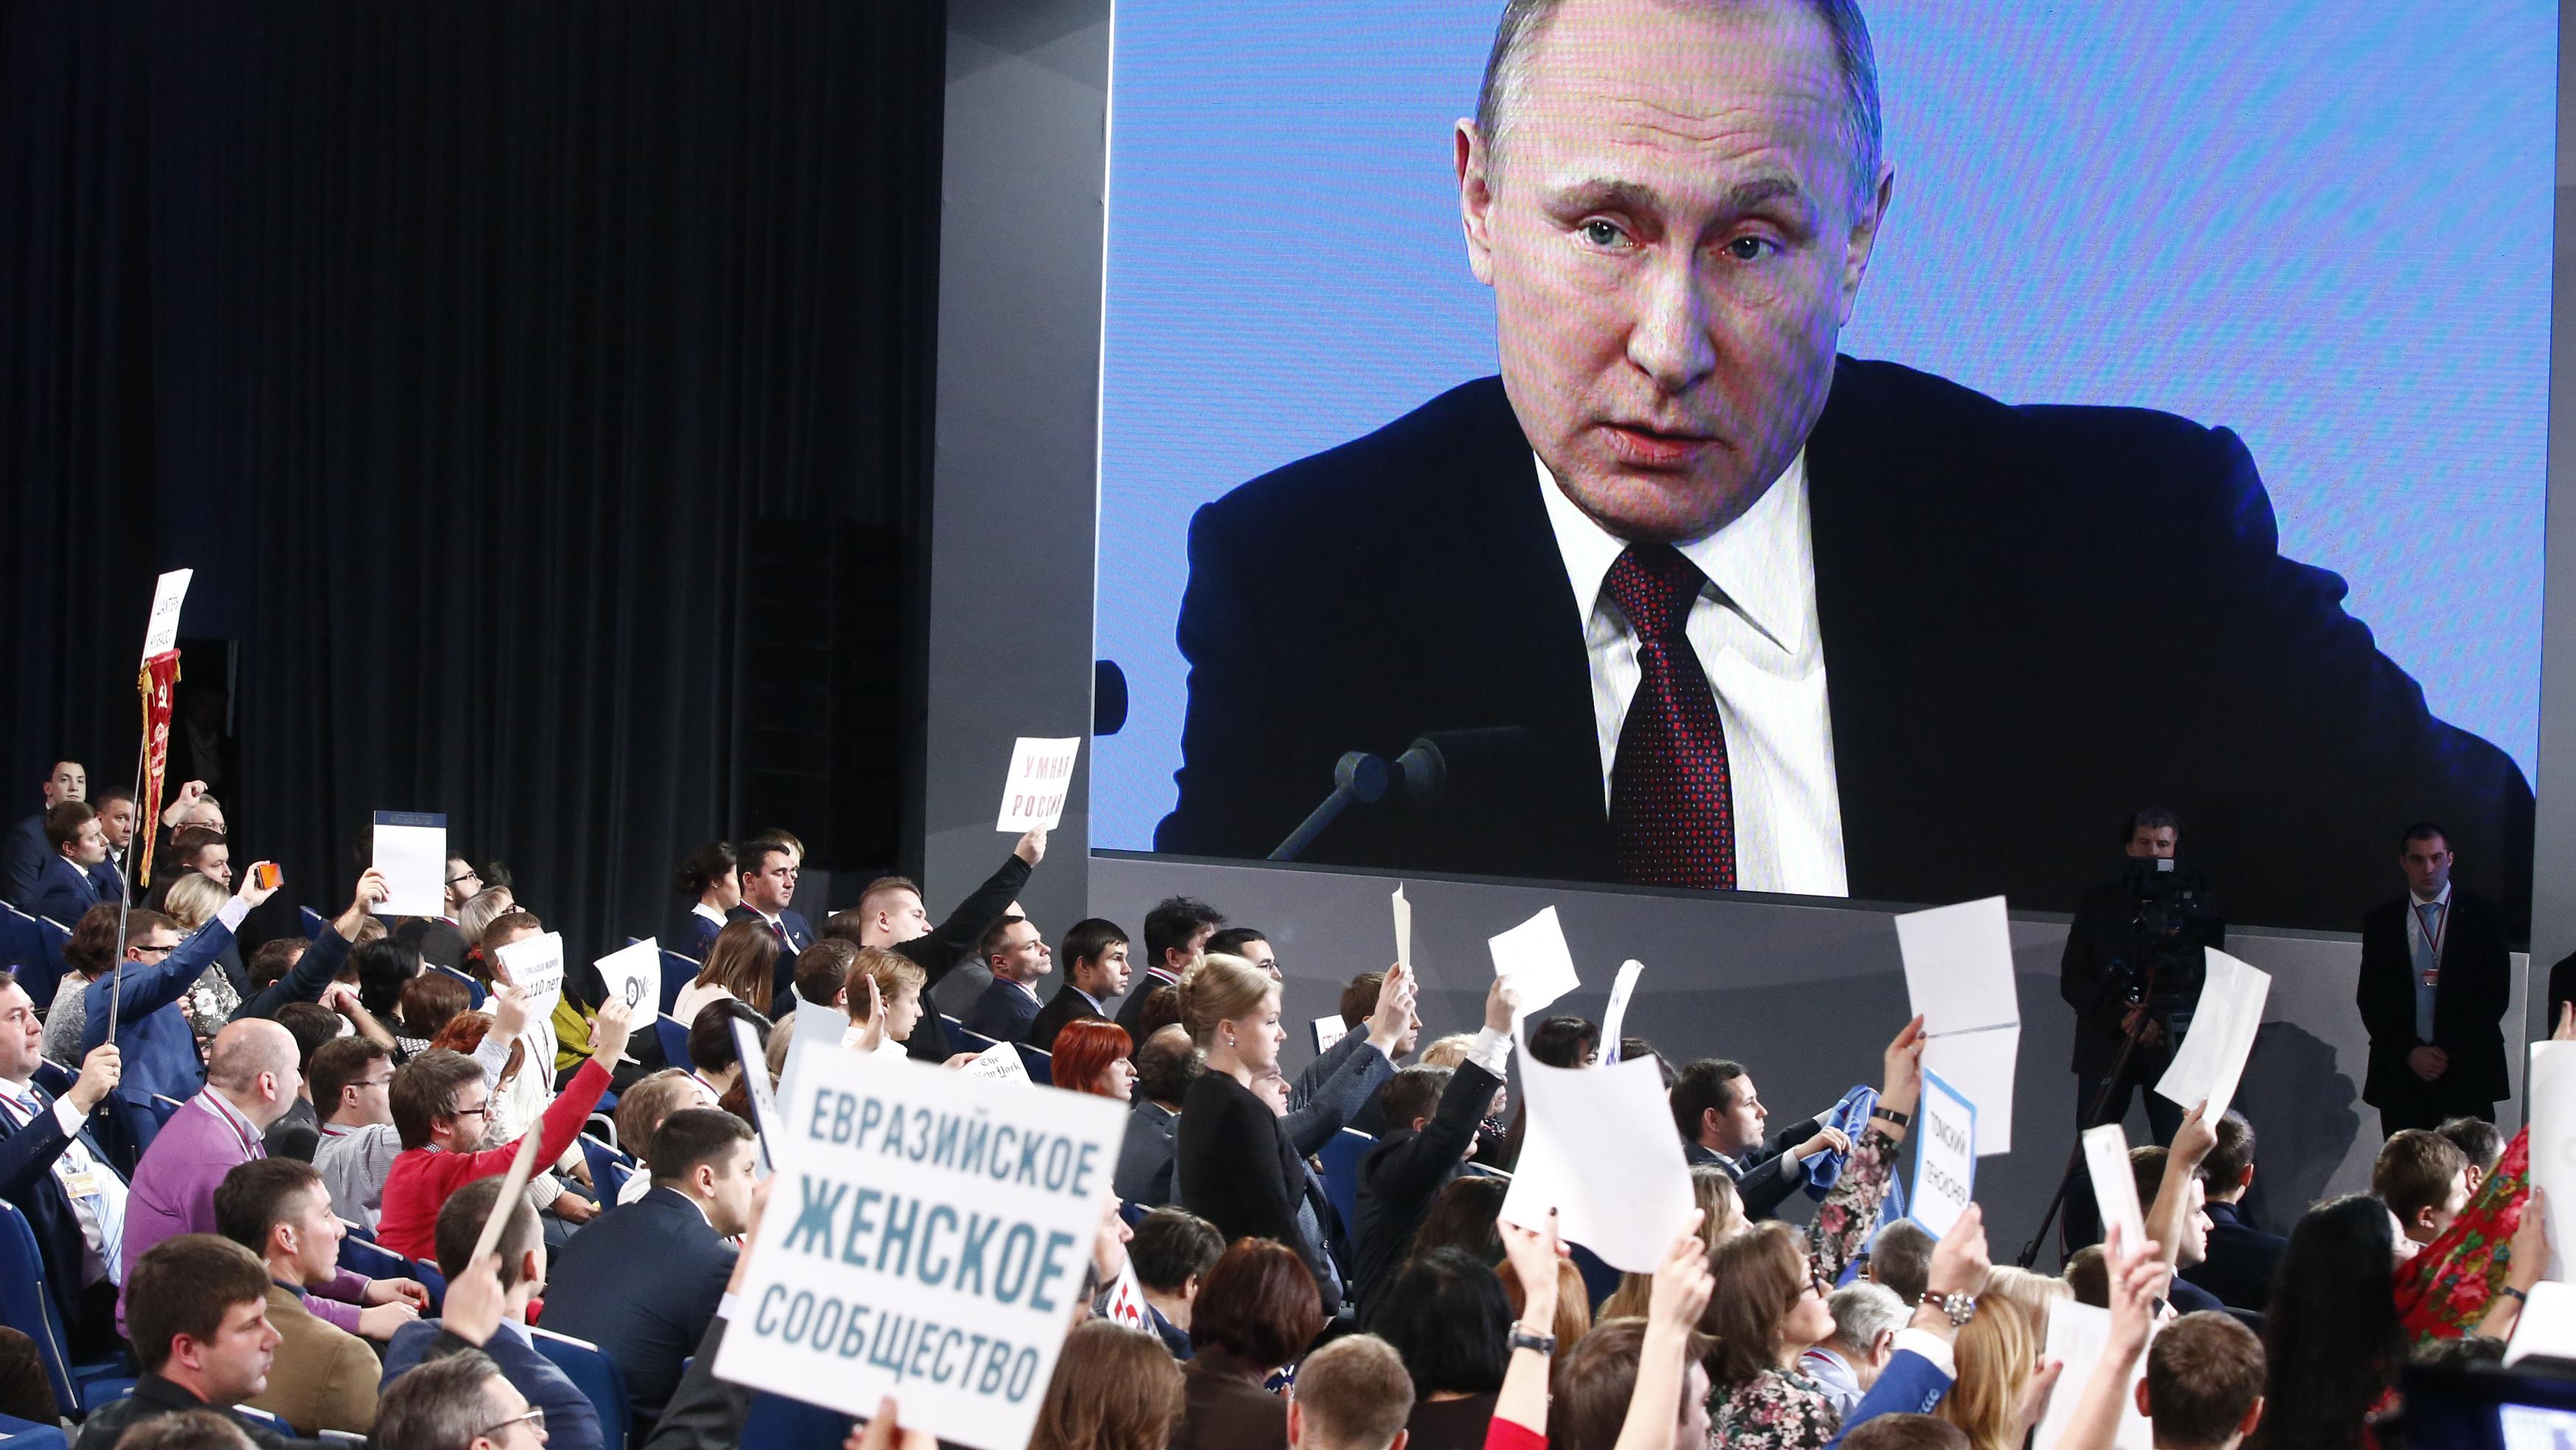 Vladimir Putin press conference